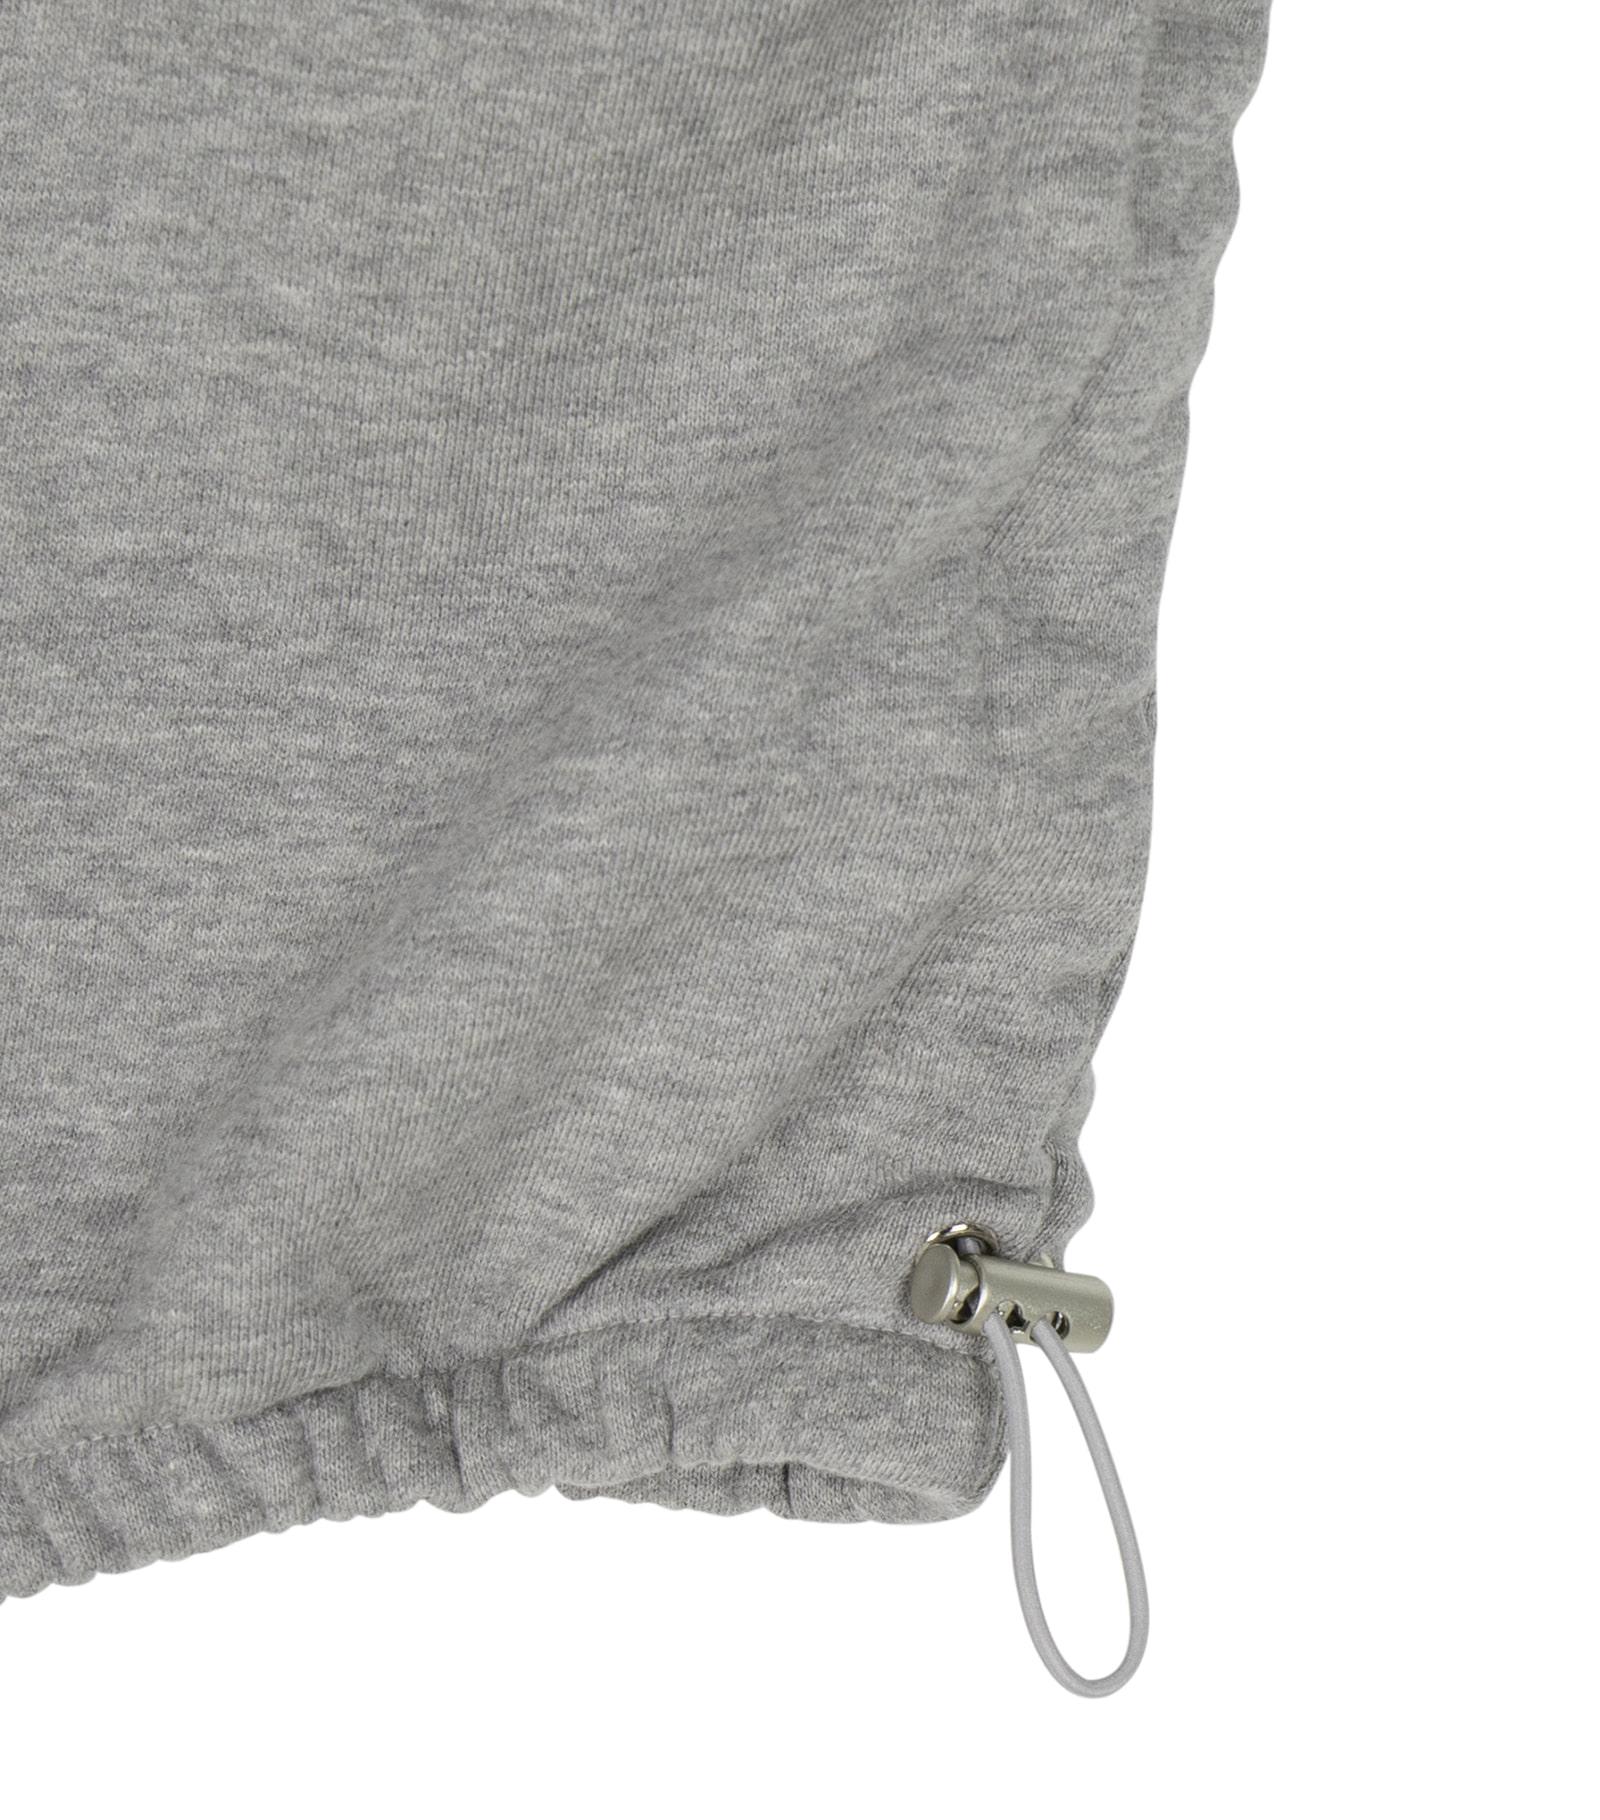 General stopper hoodie zip-up sweatshirt